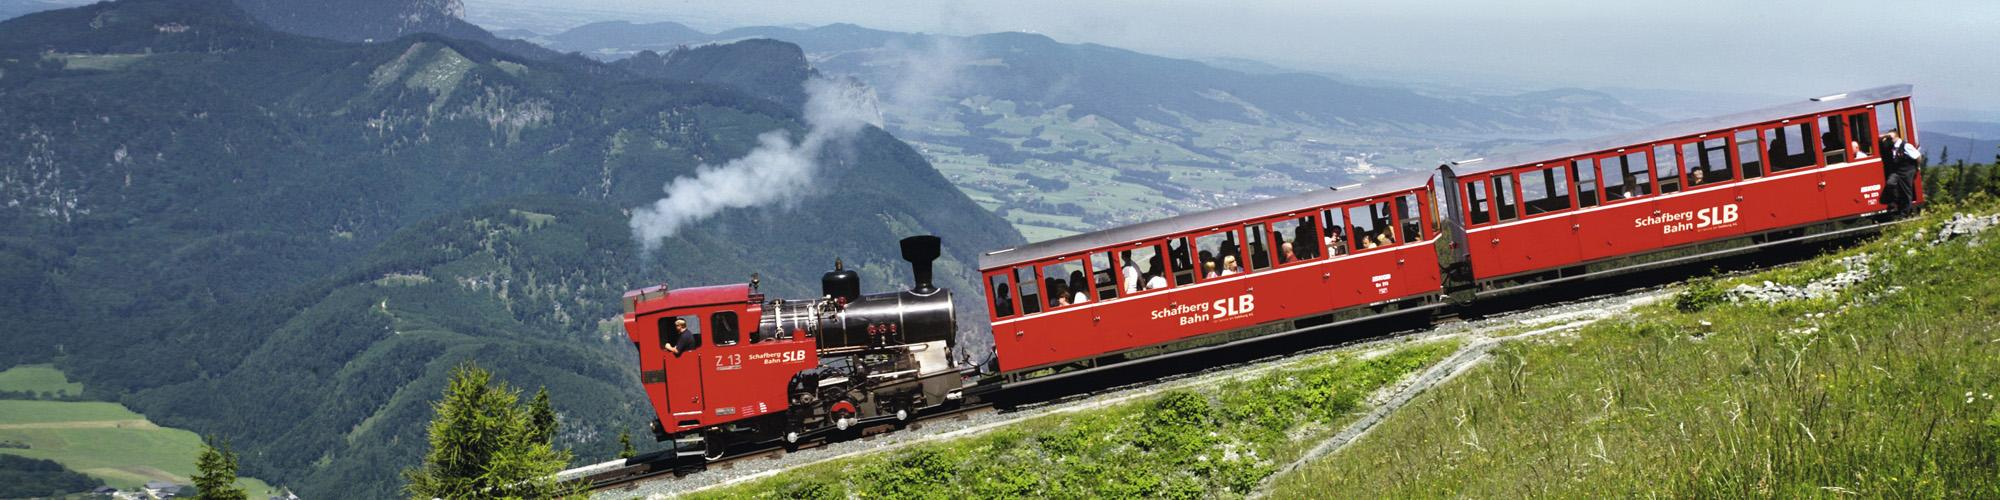 Schafbergbahn - © Salzburger Lokalbahnen